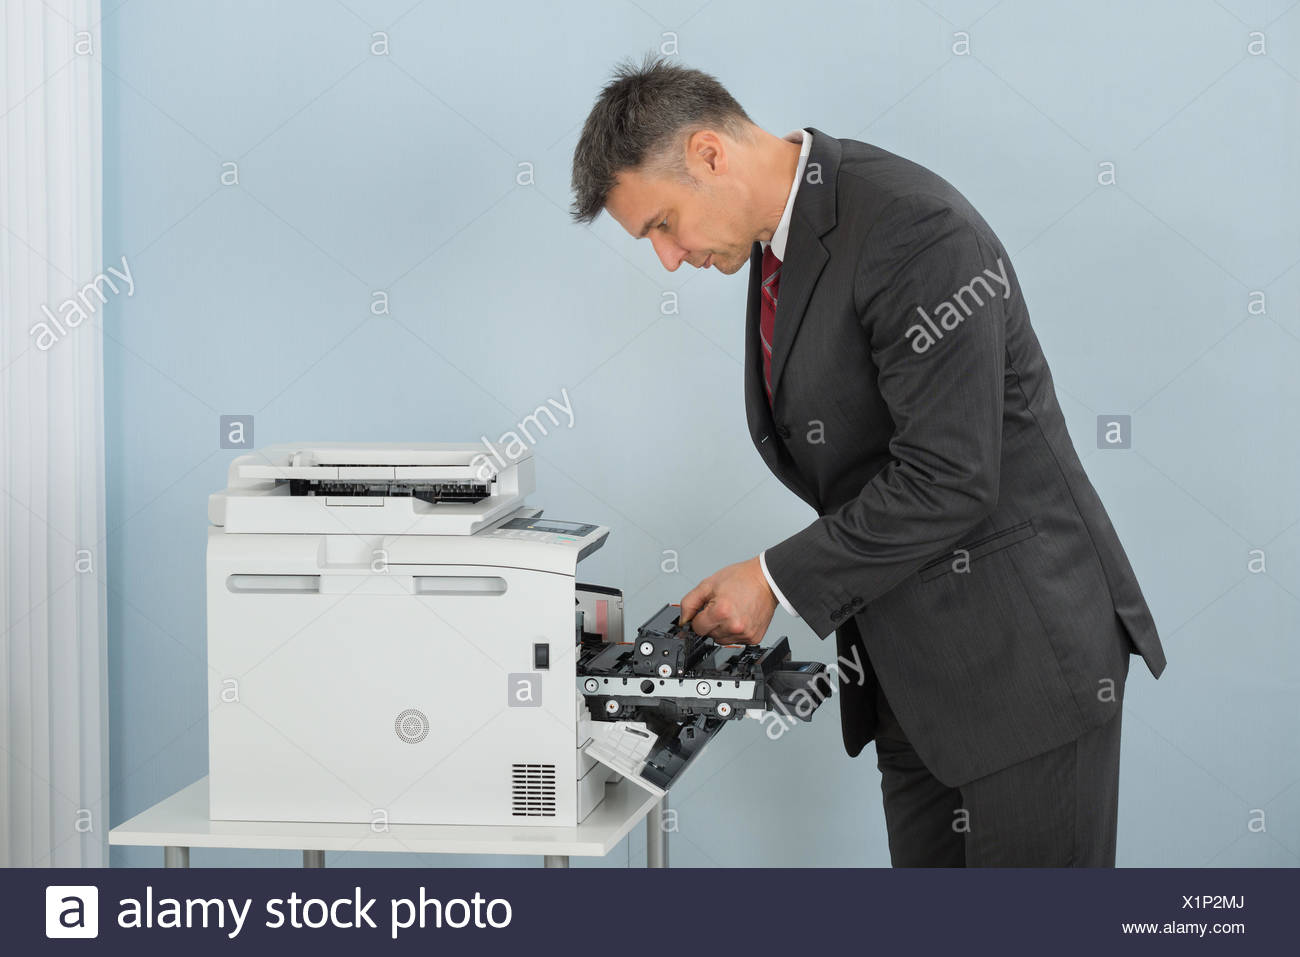 Businessman Fixing Cartridge In Printer Machine At Office - Stock Image